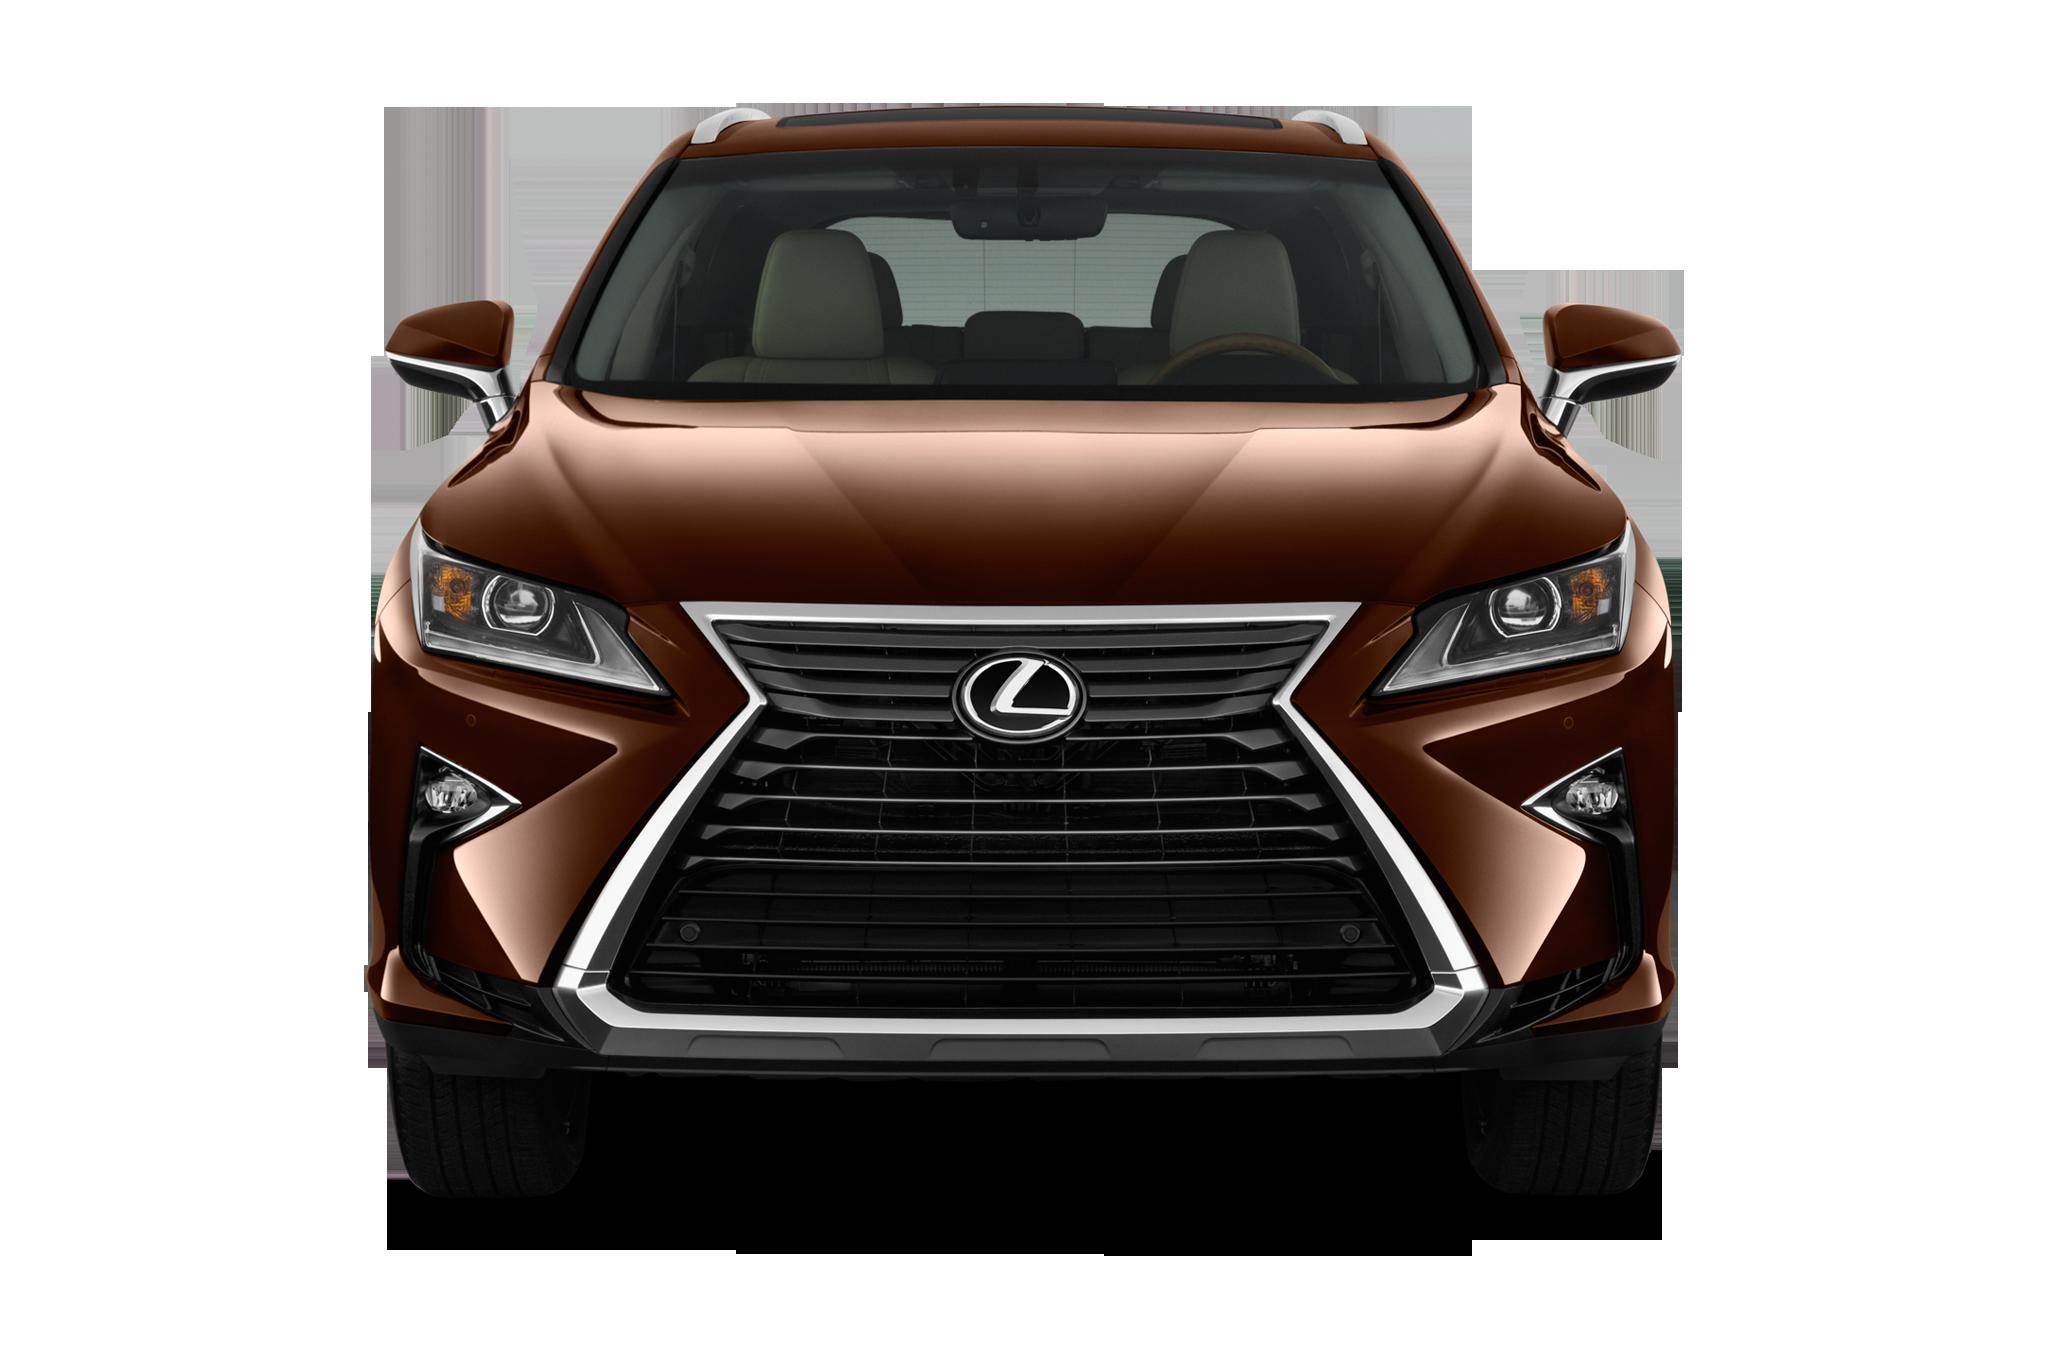 2018 Lexus Rx350l Awd Quick Take Review Automobile Magazine